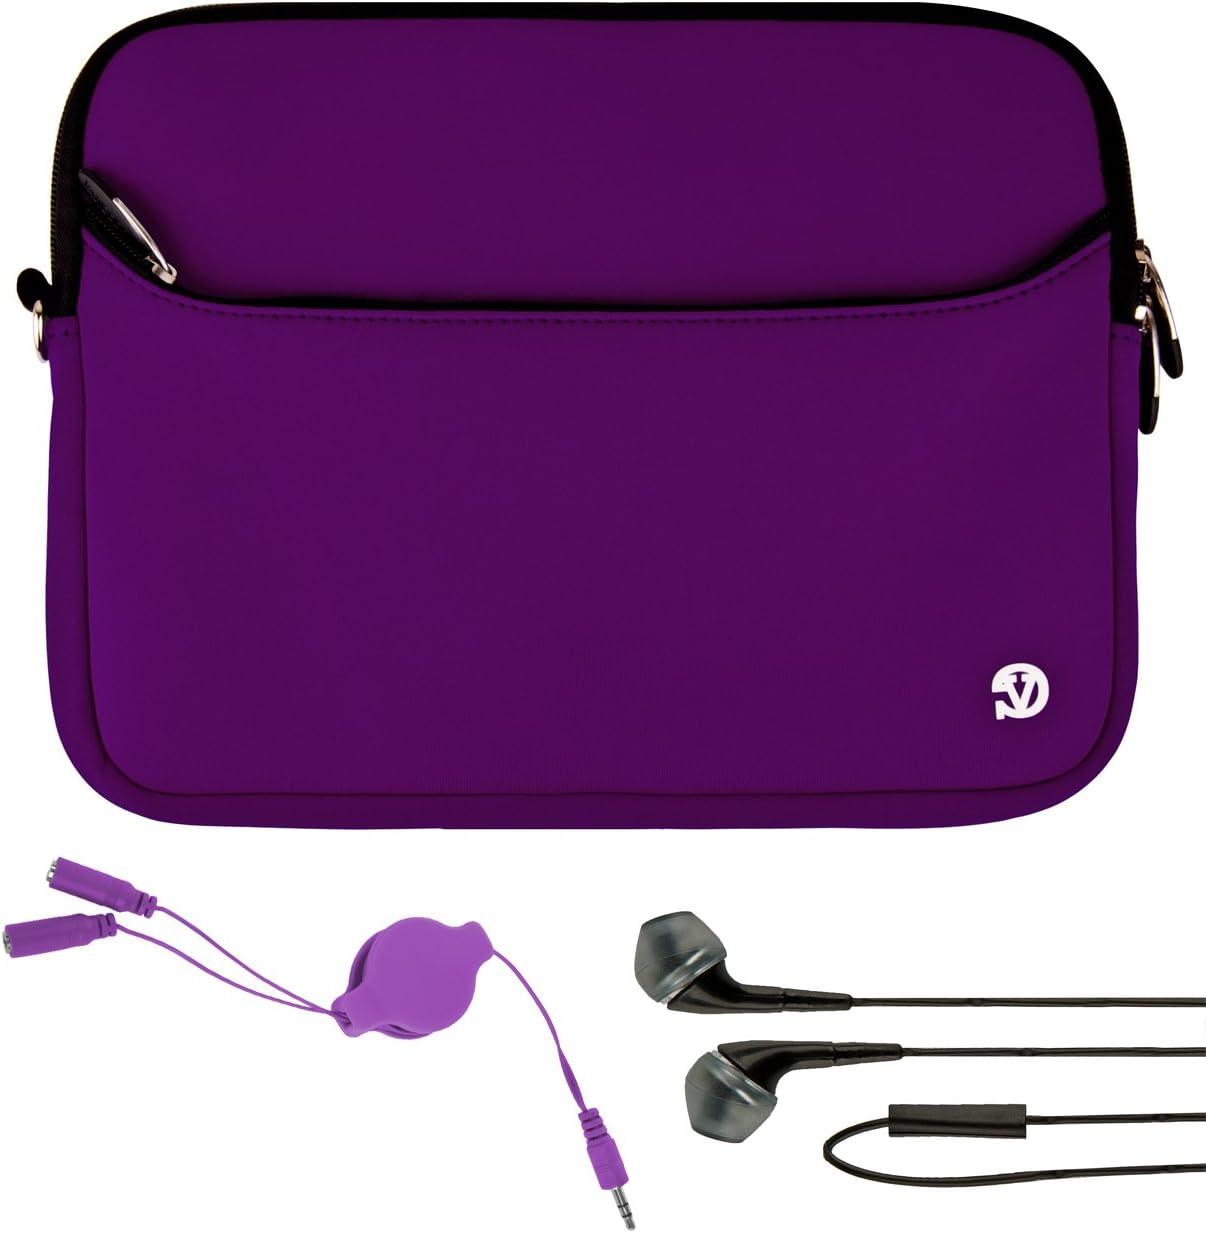 "VanGoddy Protective Purple Neoprene Padded Sleeve for HP ElitePad 1000 G2, Pavilion x2 10.1"" Tablet's + Audio Splitter and Earbud's"